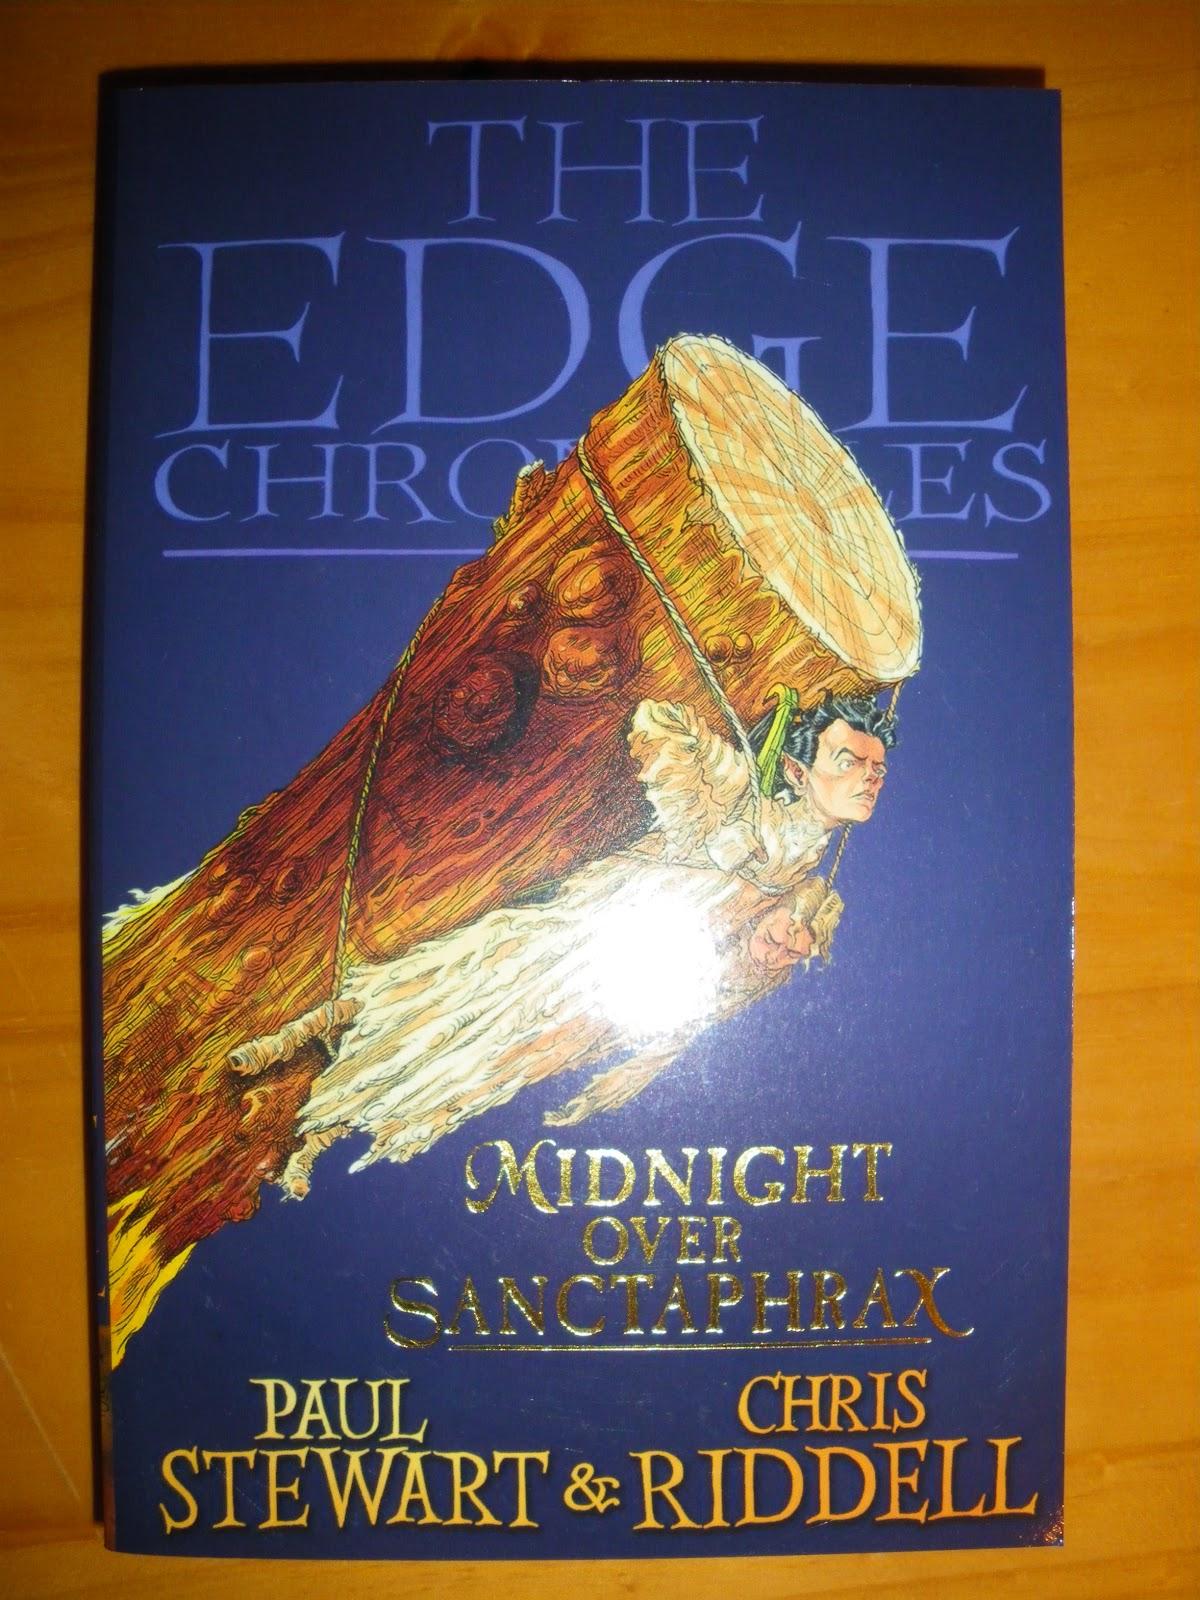 The Edge Chronicles 6 Midnight Over Sanctaphrax